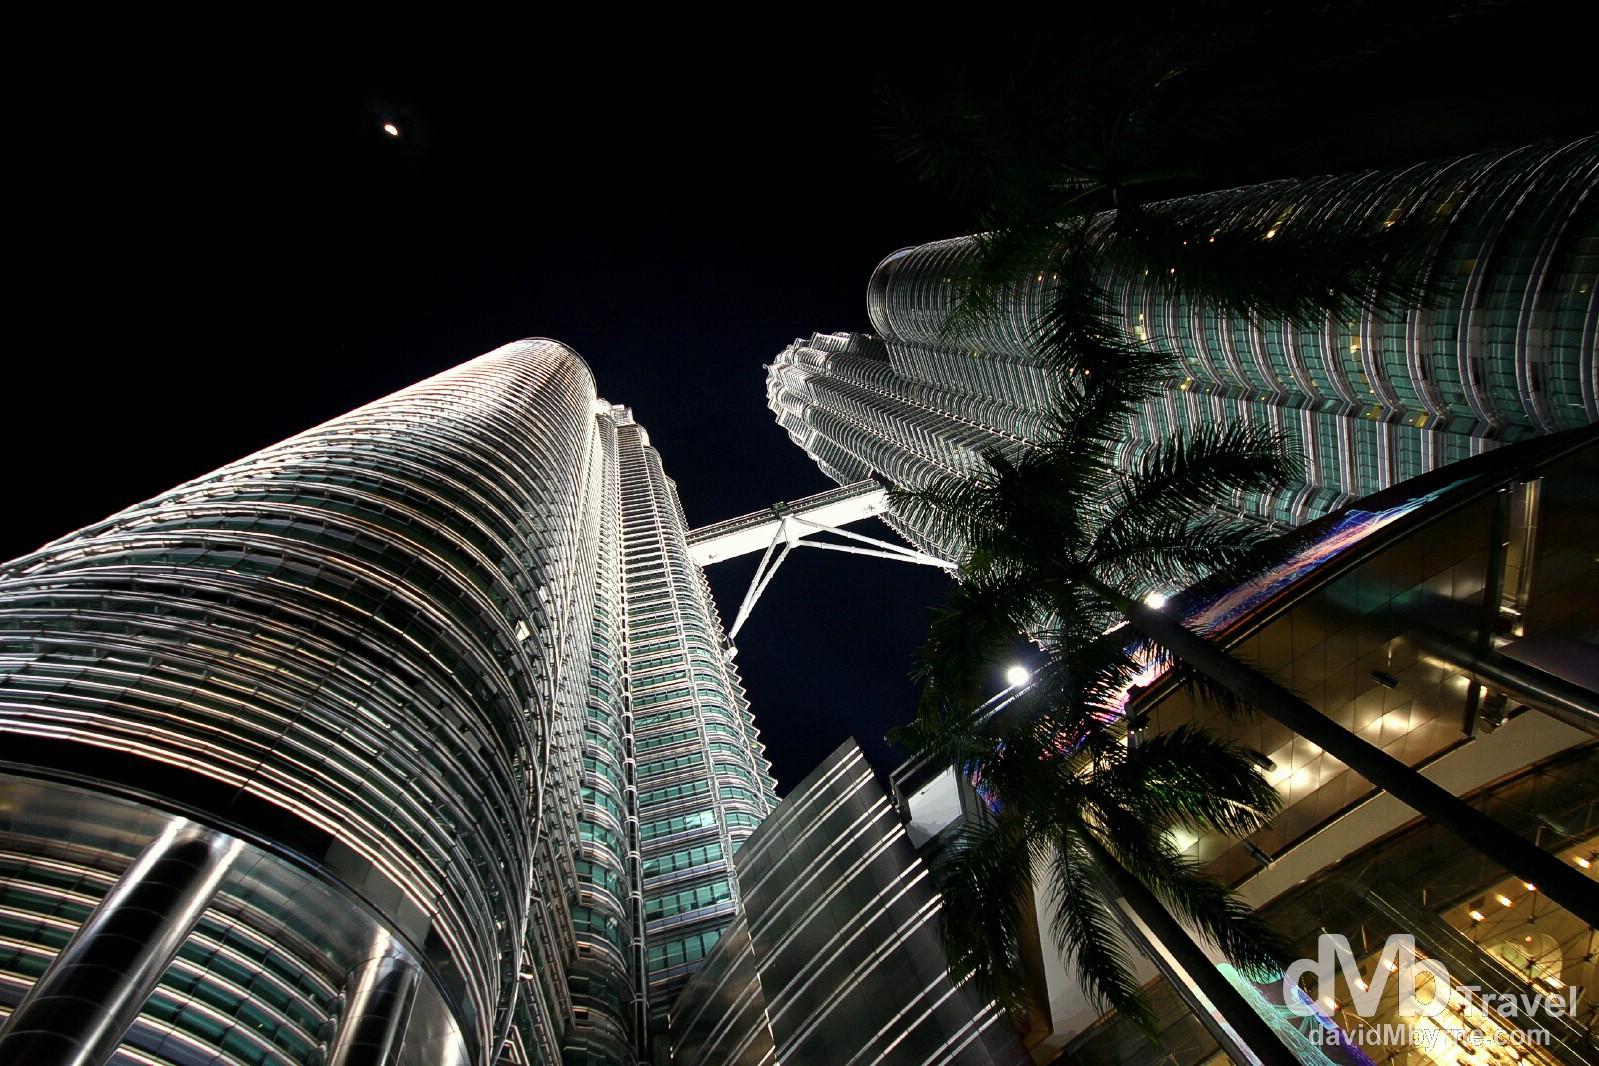 Skyward. Petronas Towers, Kuala Lumpur, Malaysia. March 31st 2012.